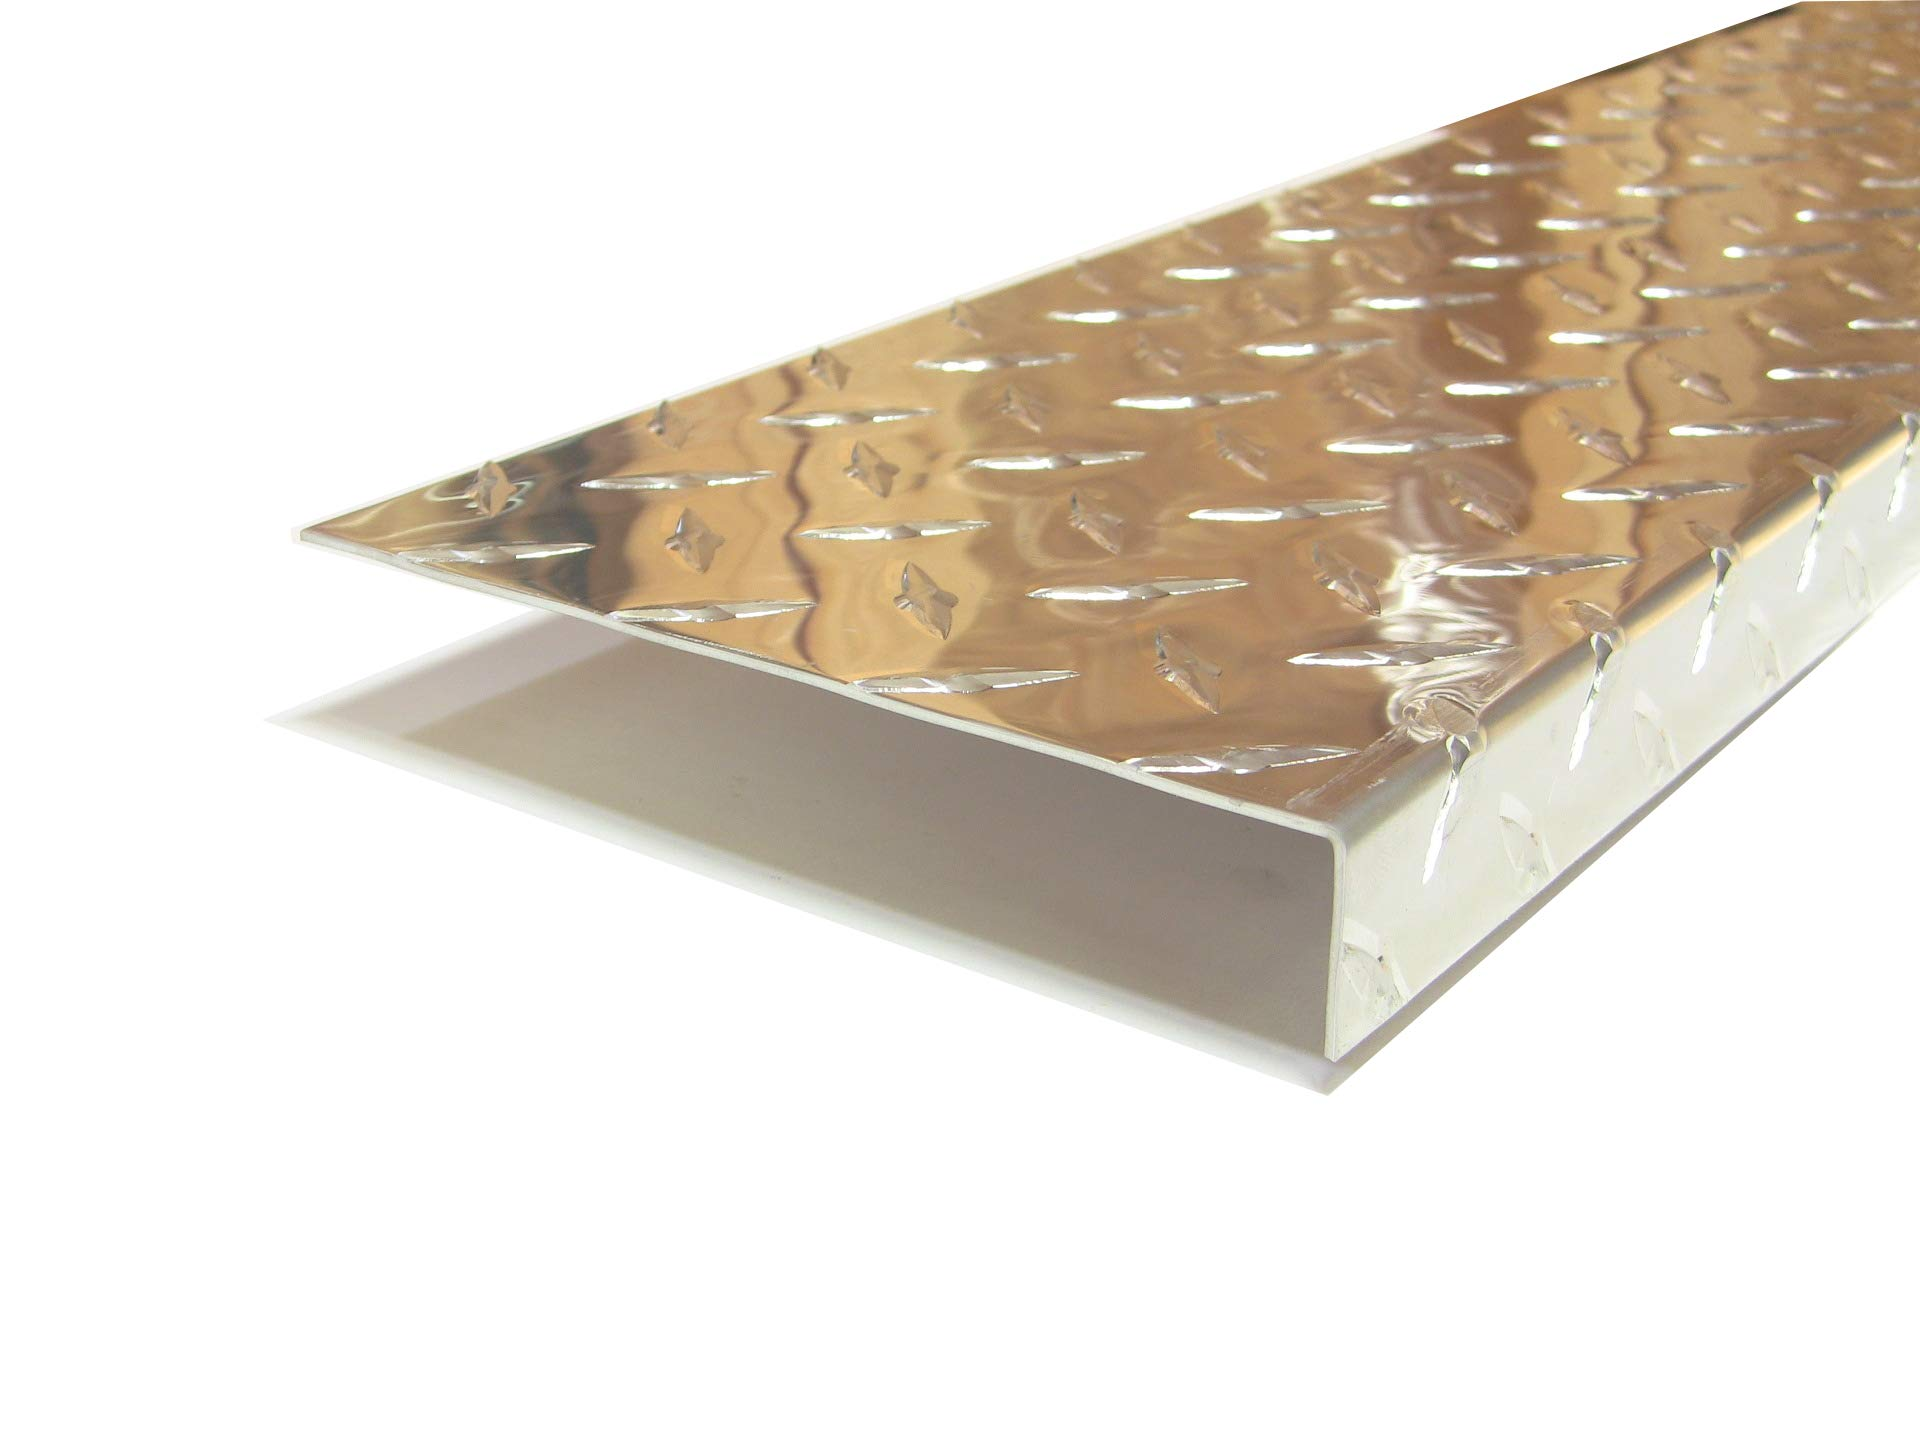 Aluminum Diamond Plate Angle .062 x 1 x 6 x 48 in. Offset UAAC (1pcs) | (1/16 x 1 x 6 x 48 in.)